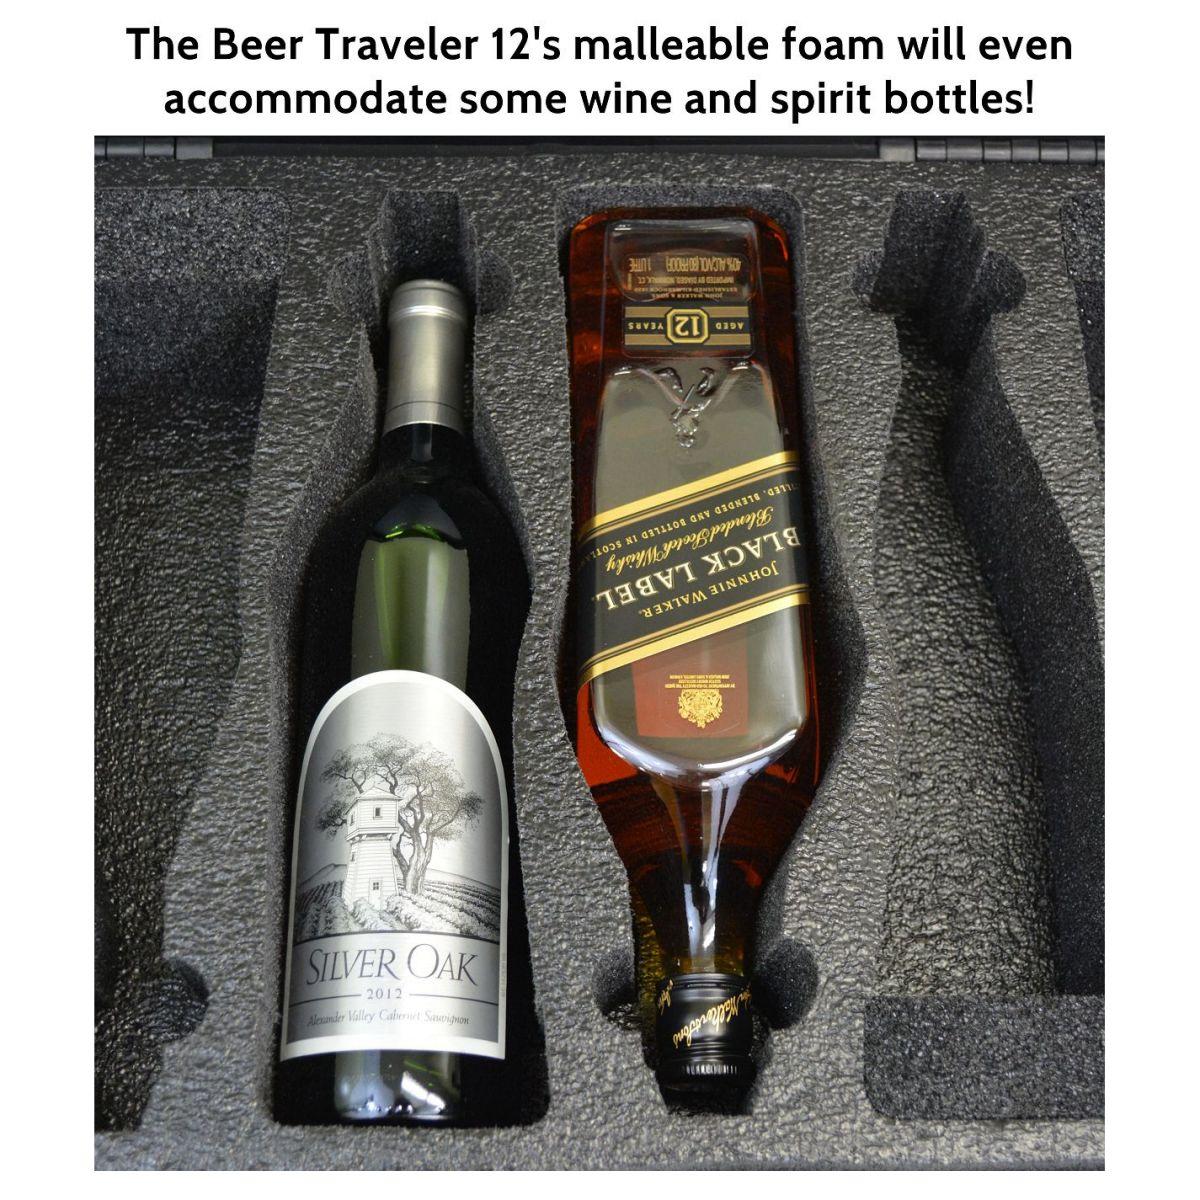 Seahorse SE-920 BC Beer Traveler 12 Custom Foam Case - Wine & Spirits, too!